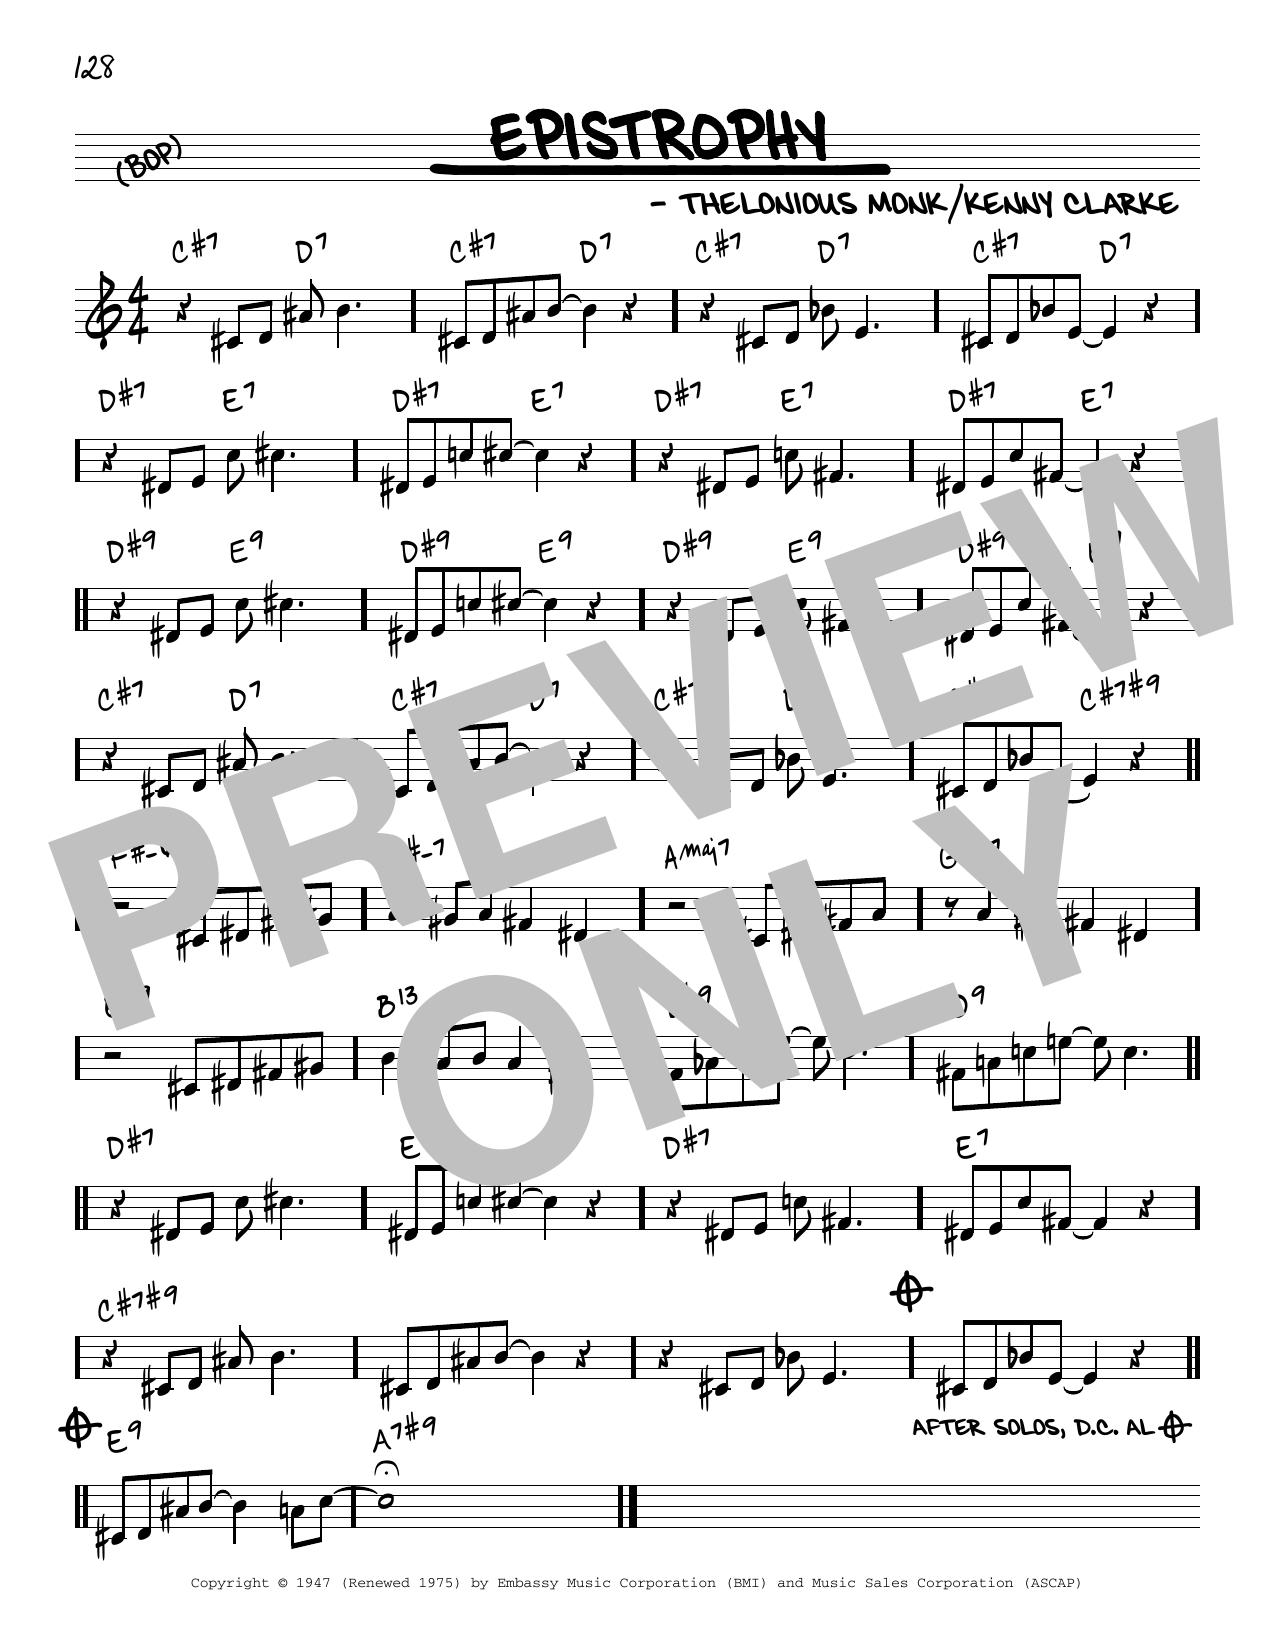 Thelonious Monk Epistrophy [Reharmonized version] (arr. Jack Grassel) sheet music notes printable PDF score